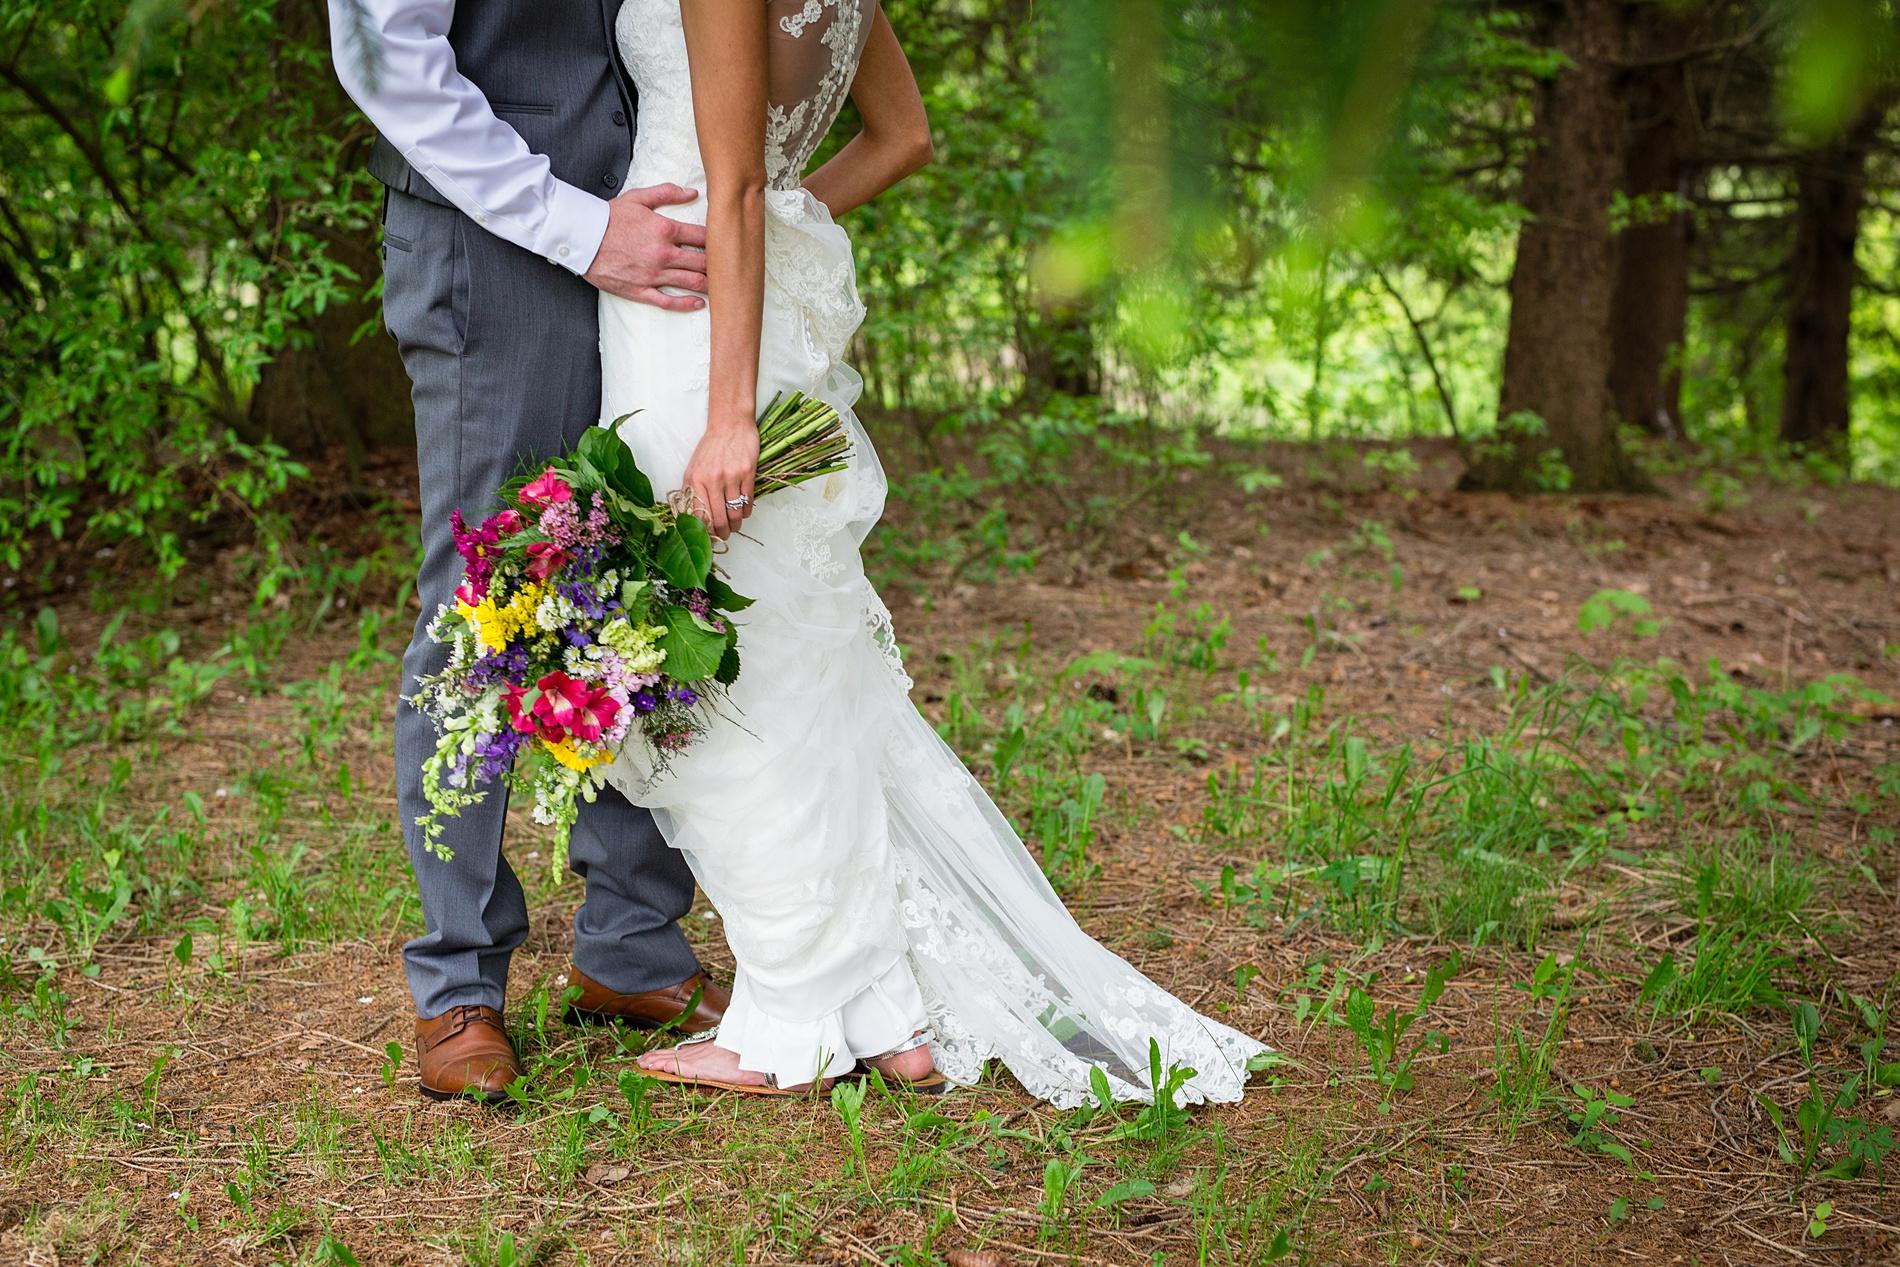 Brandon_Shafer_Photography_Brett_Autumn_Wedding_0050.jpg